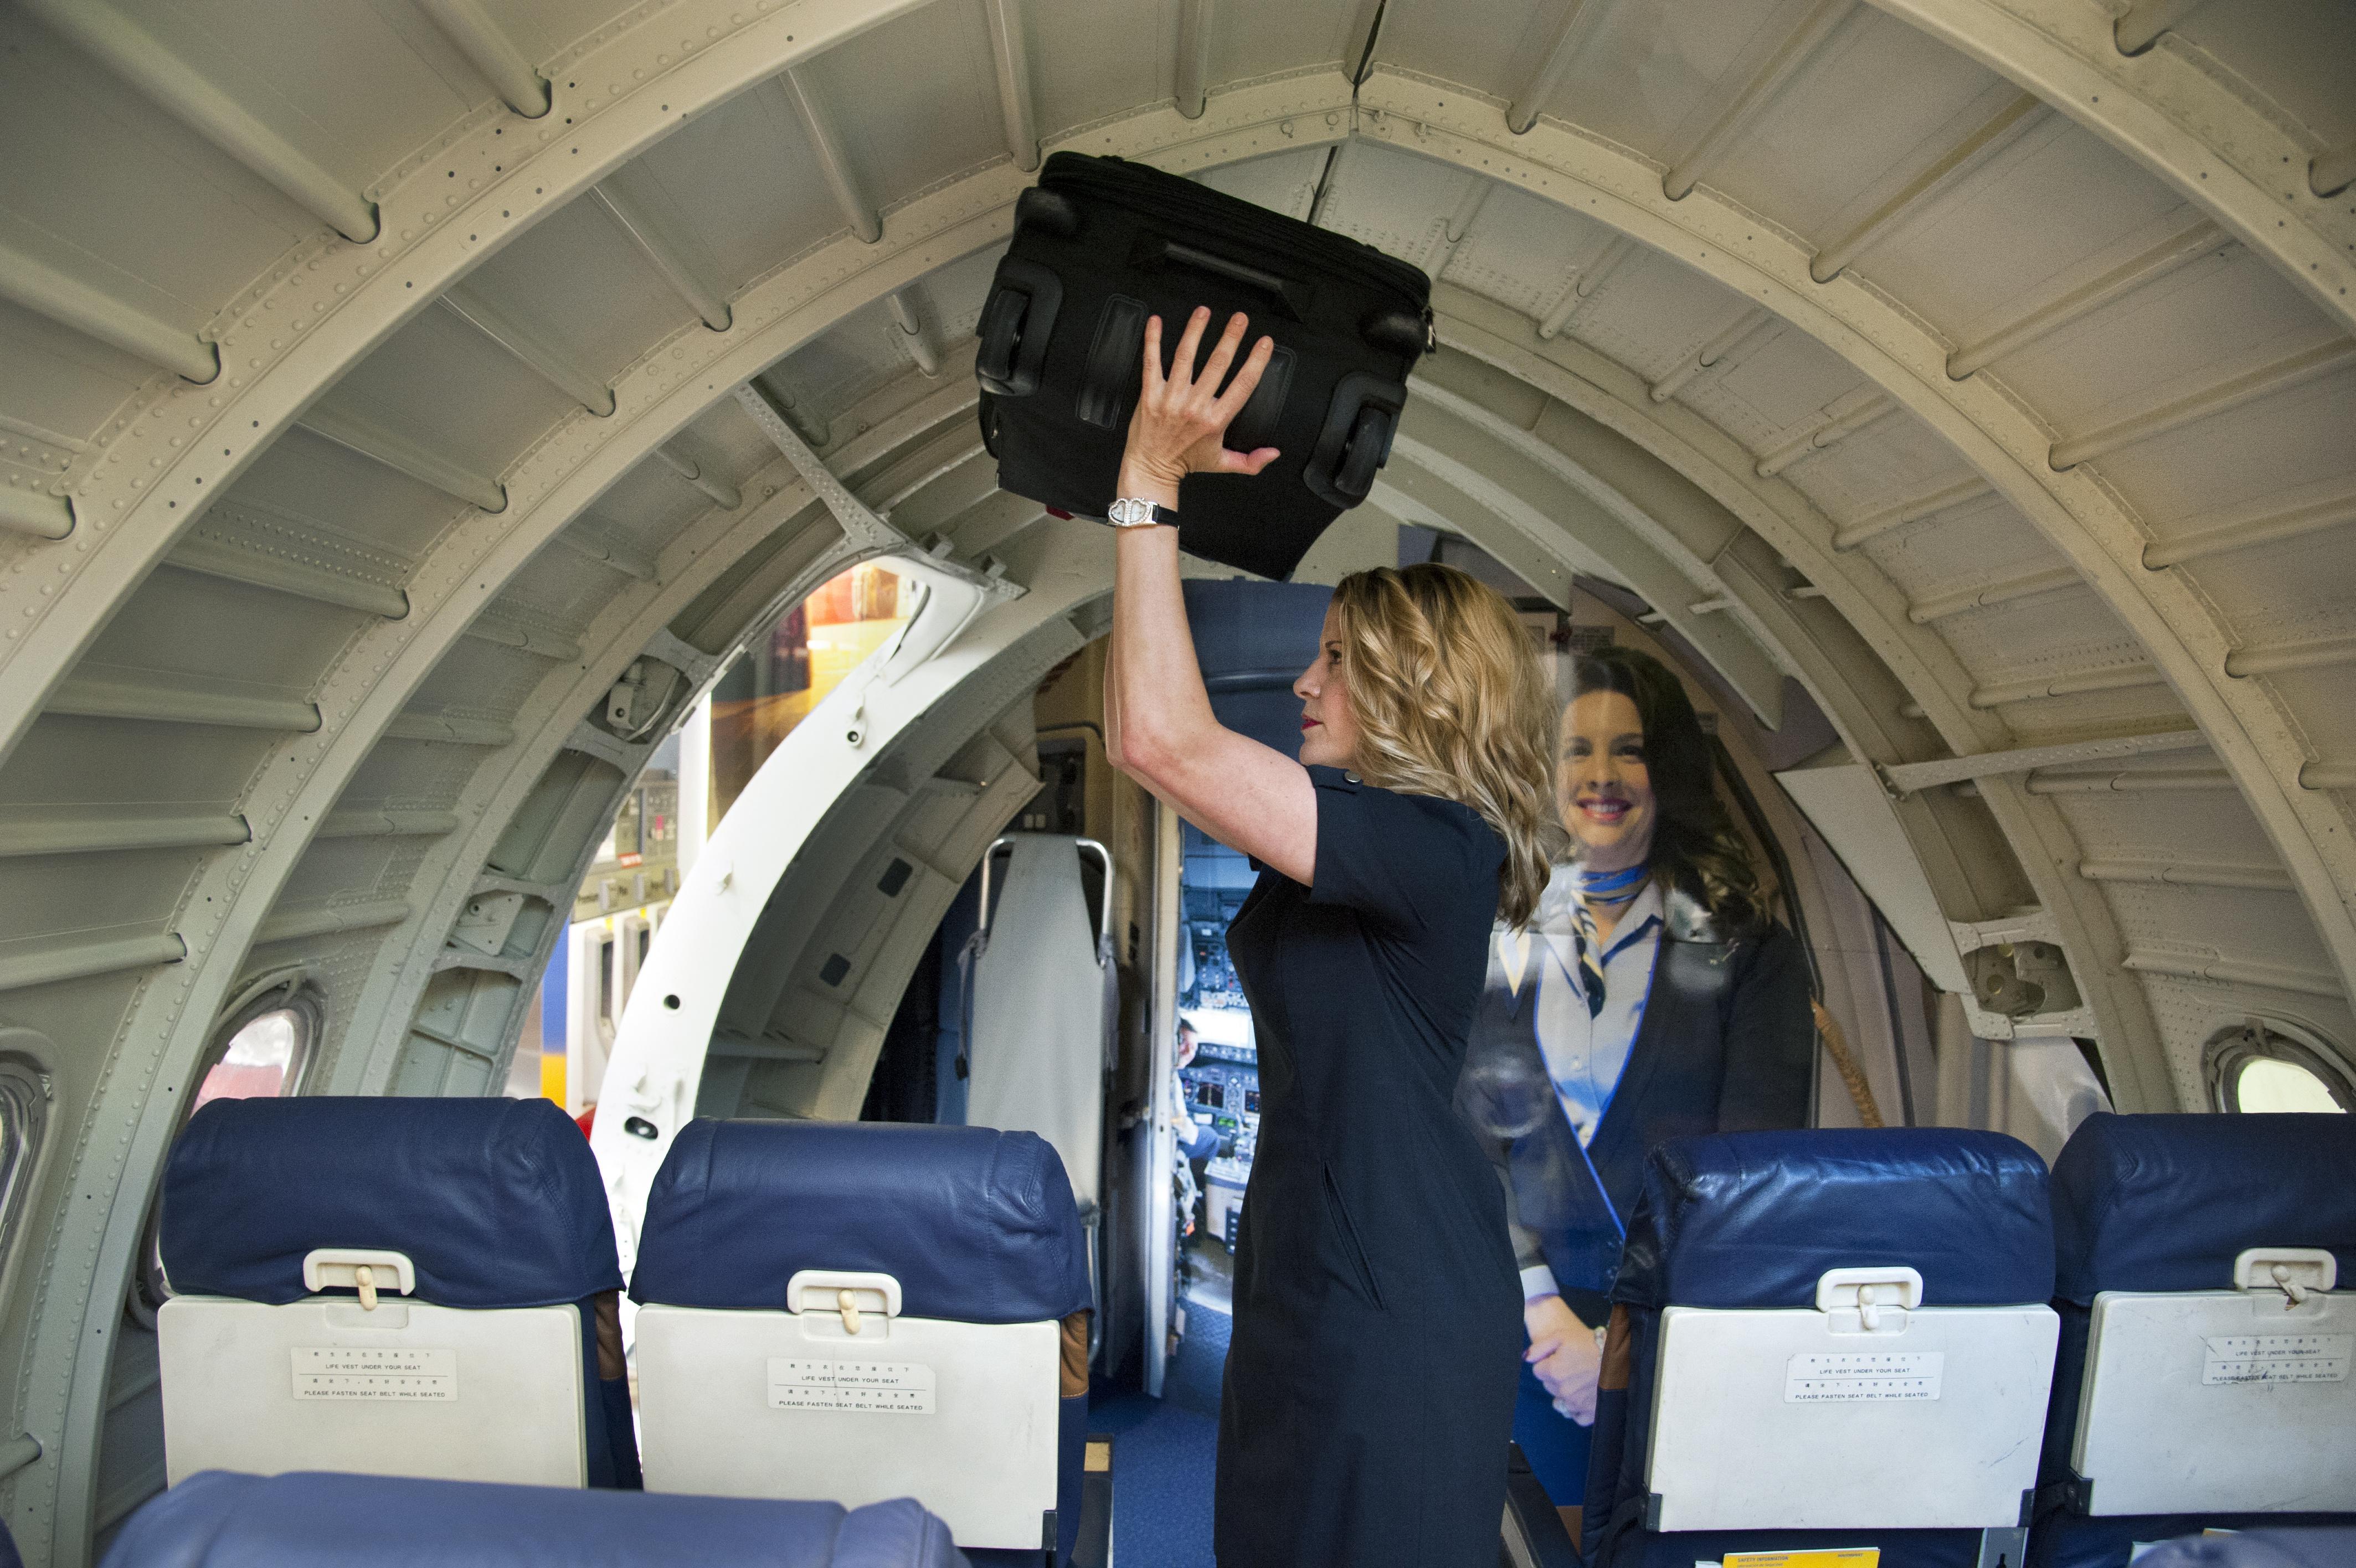 fuselage rehab helps get flight attendant flying again the fuselage rehab helps get flight attendant flying again the spokesman review